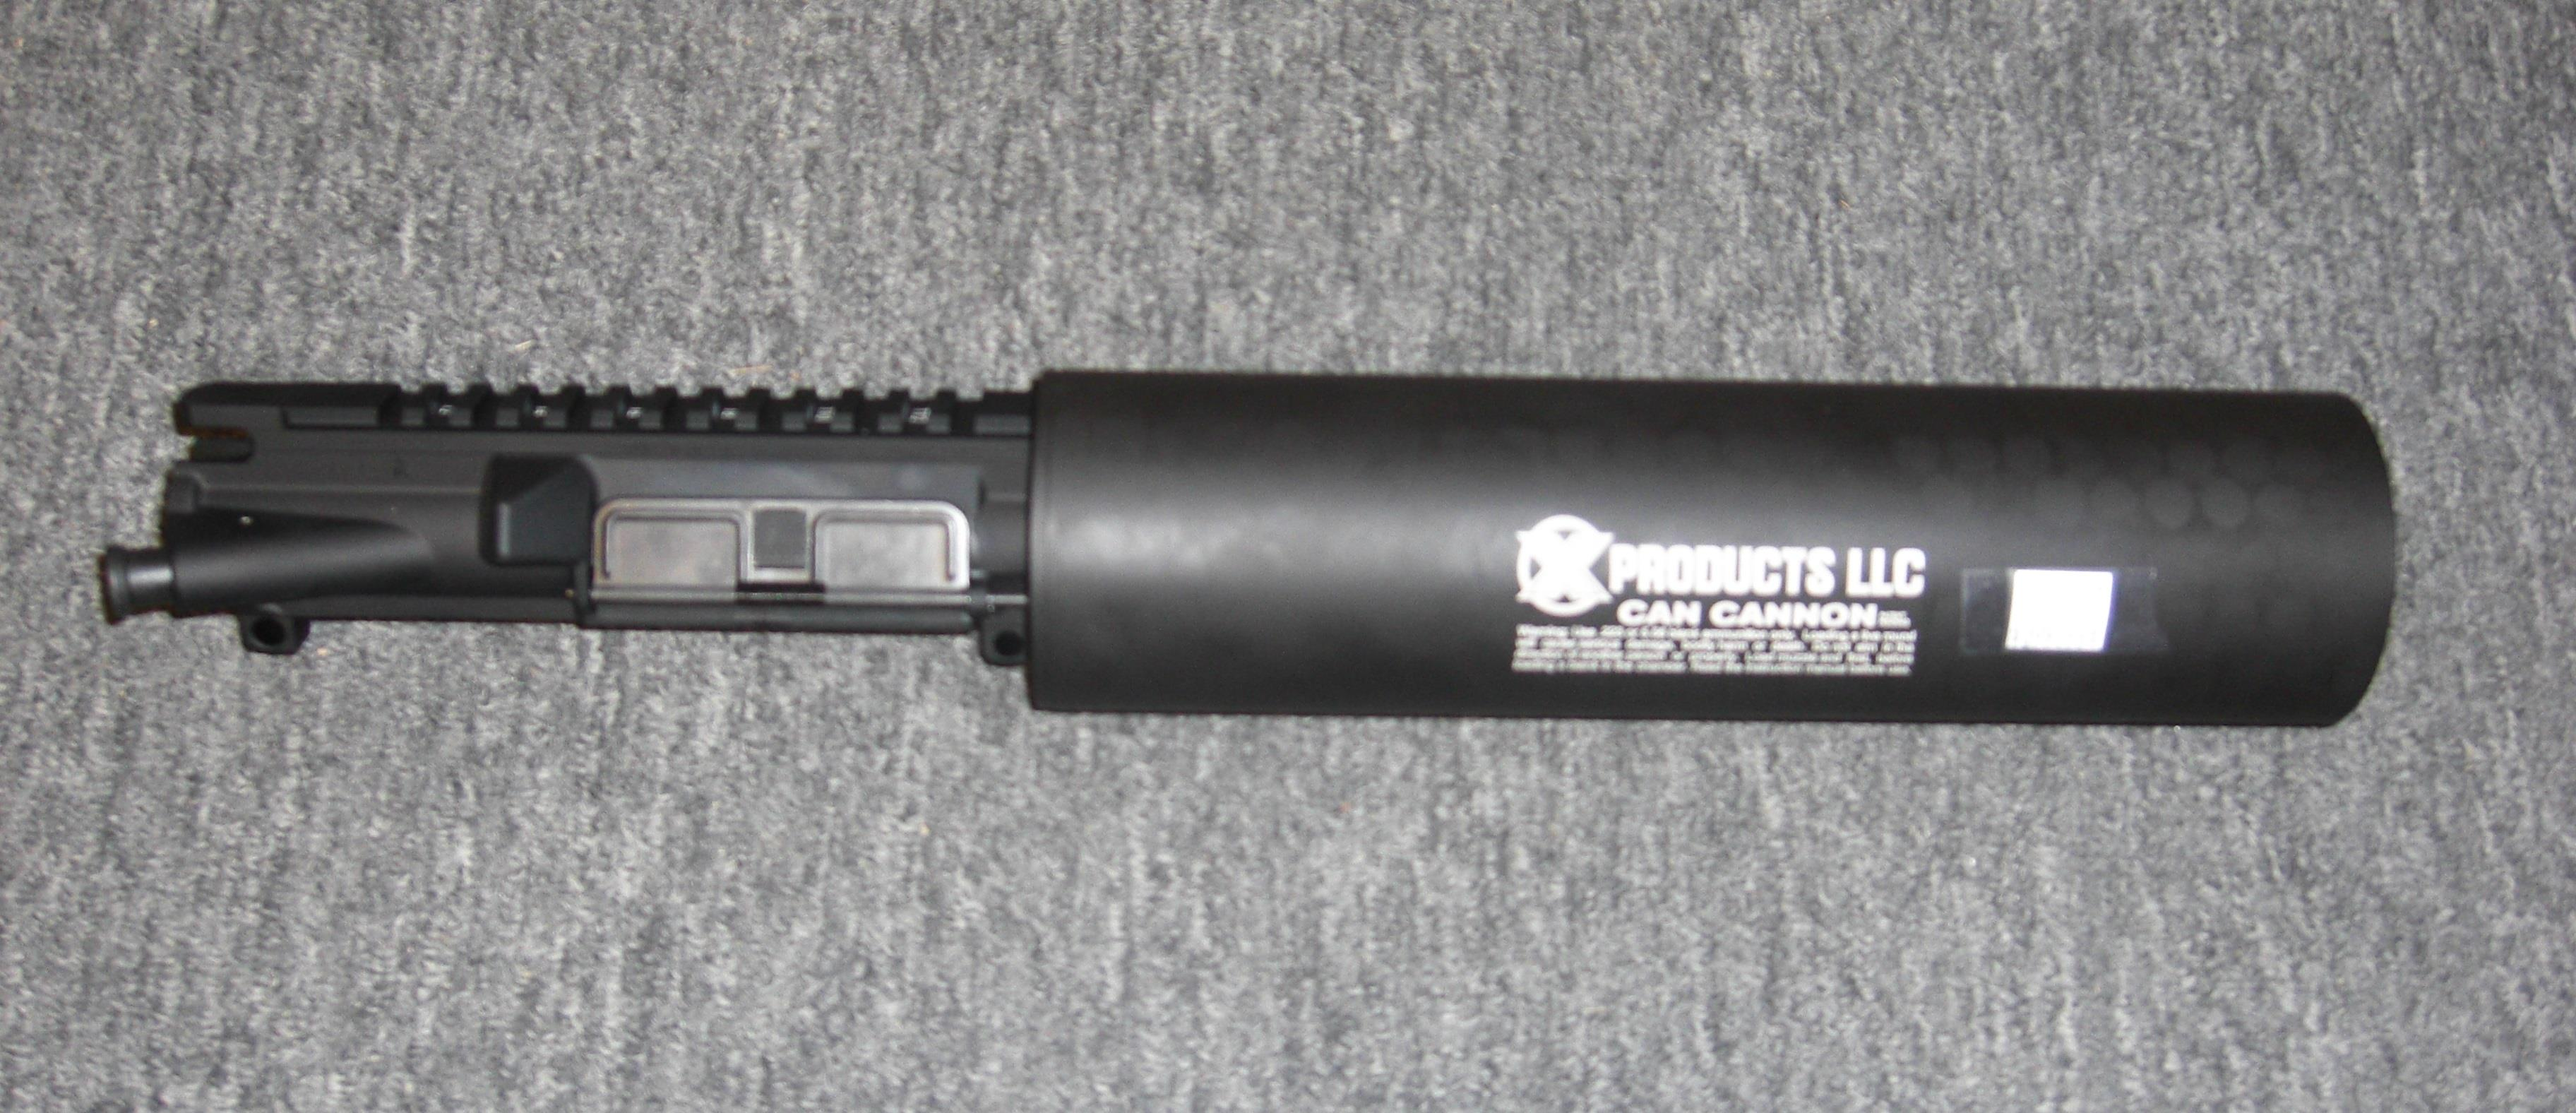 X Products LLC CAN CANNON (Soda can launcher upper)  Non-Guns > Barrels